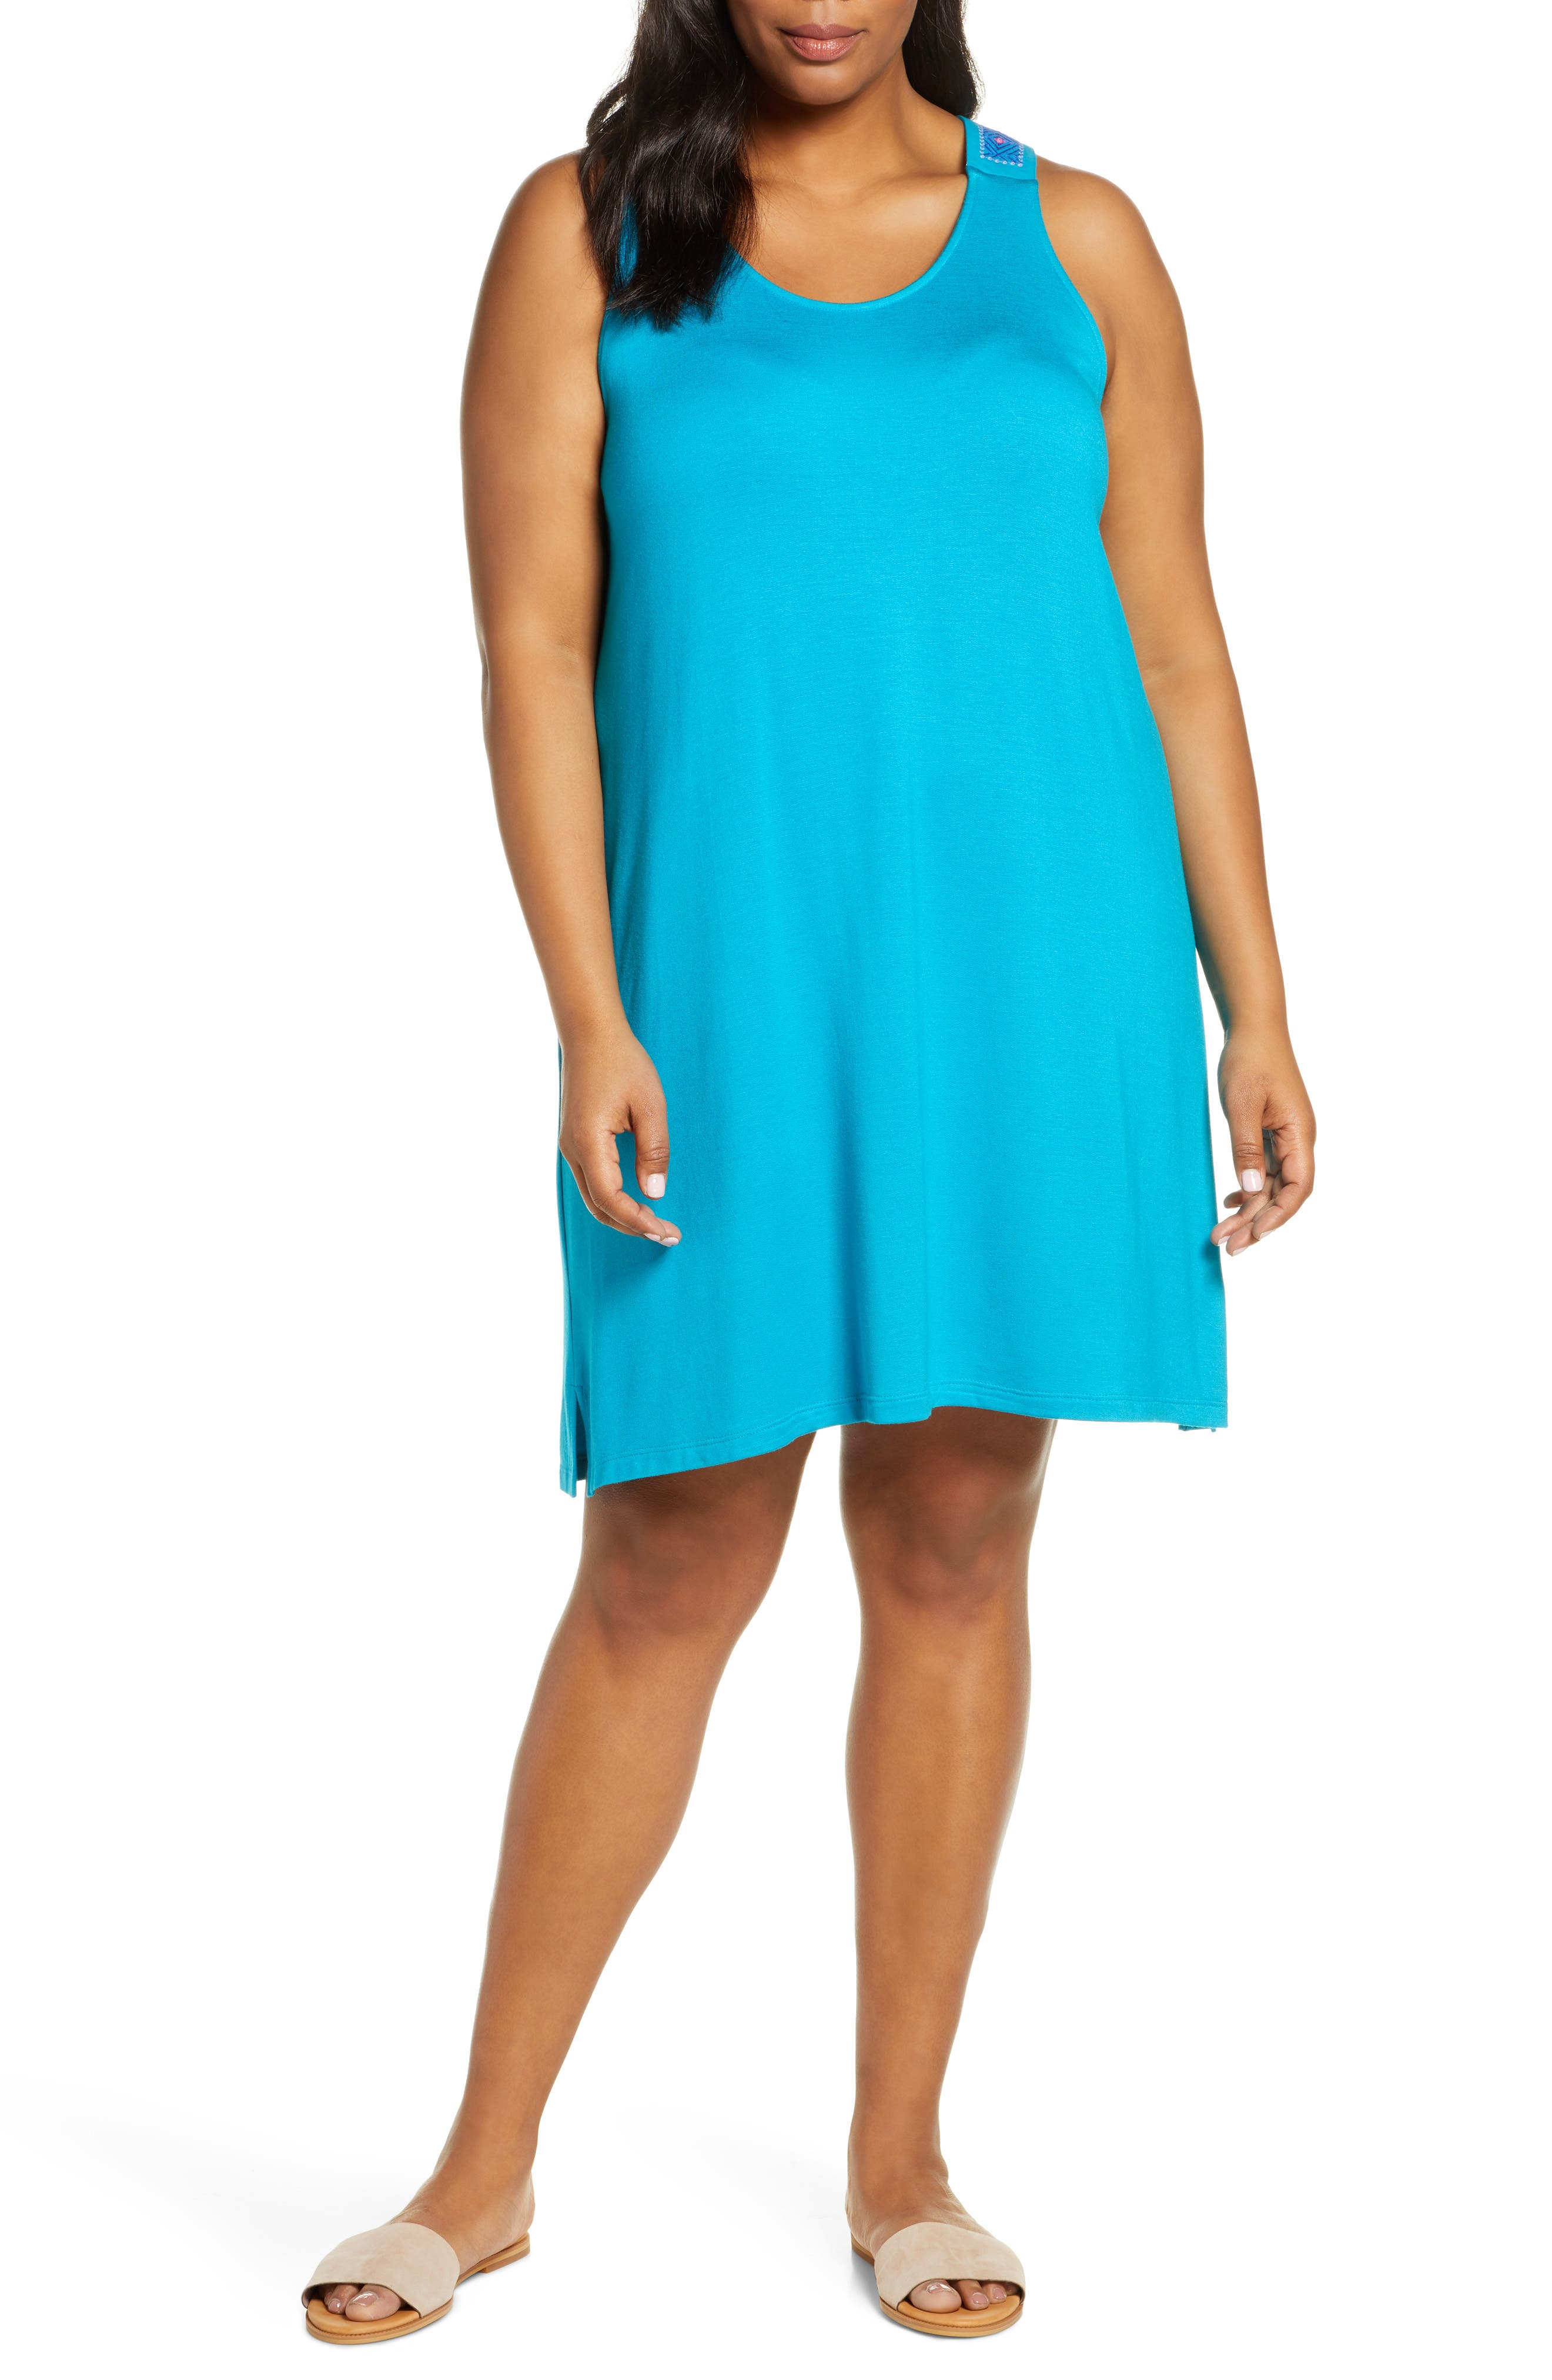 Plus Size Gibson X Hi Sugarplum! Sicily Embroidered Racerback Tank Dress, Blue